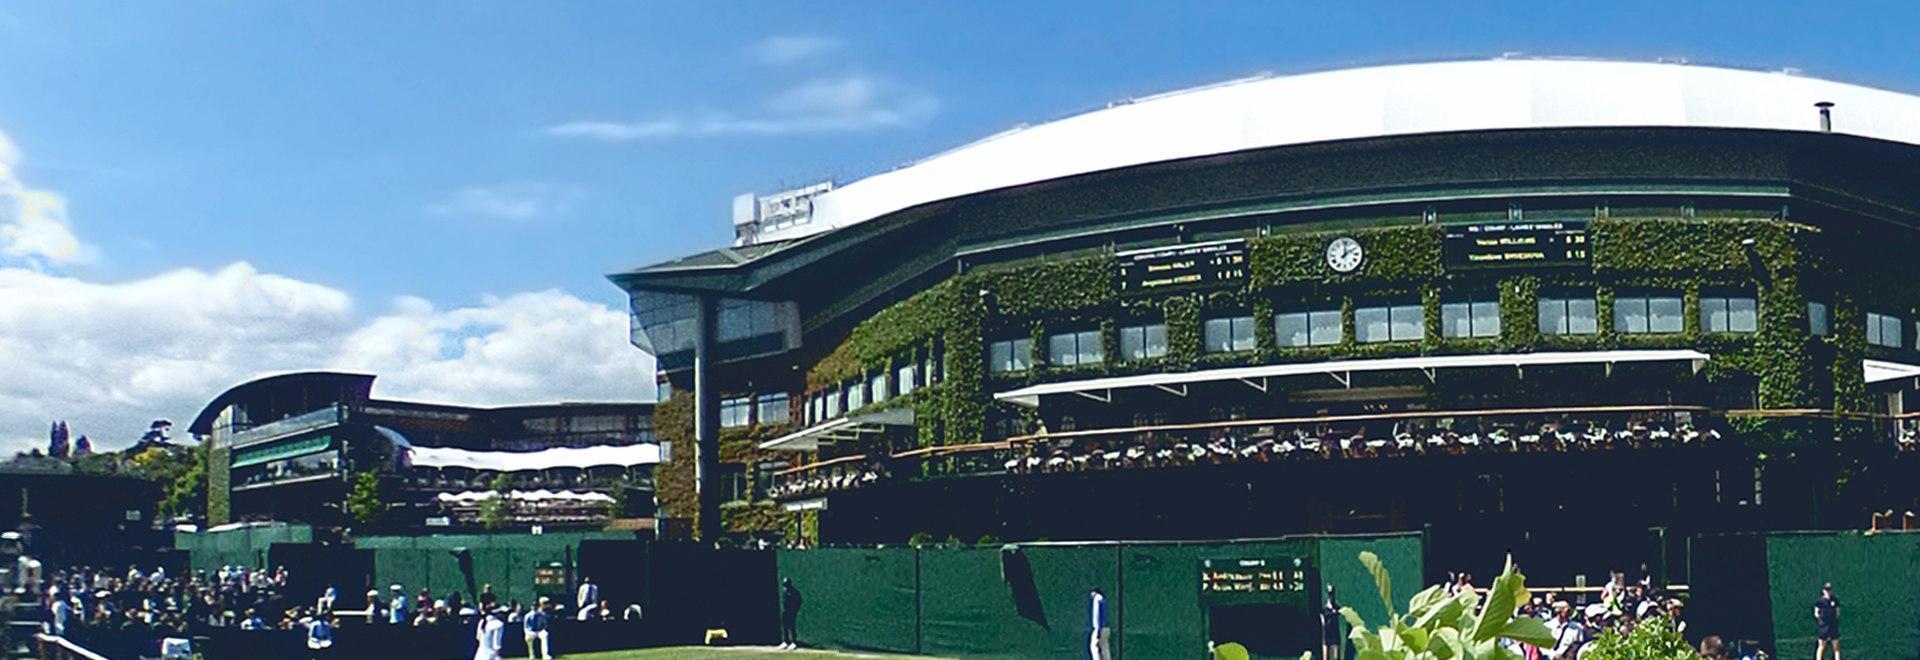 Wimbledon 2011: Bolelli - Wawrinka. Secondo turno